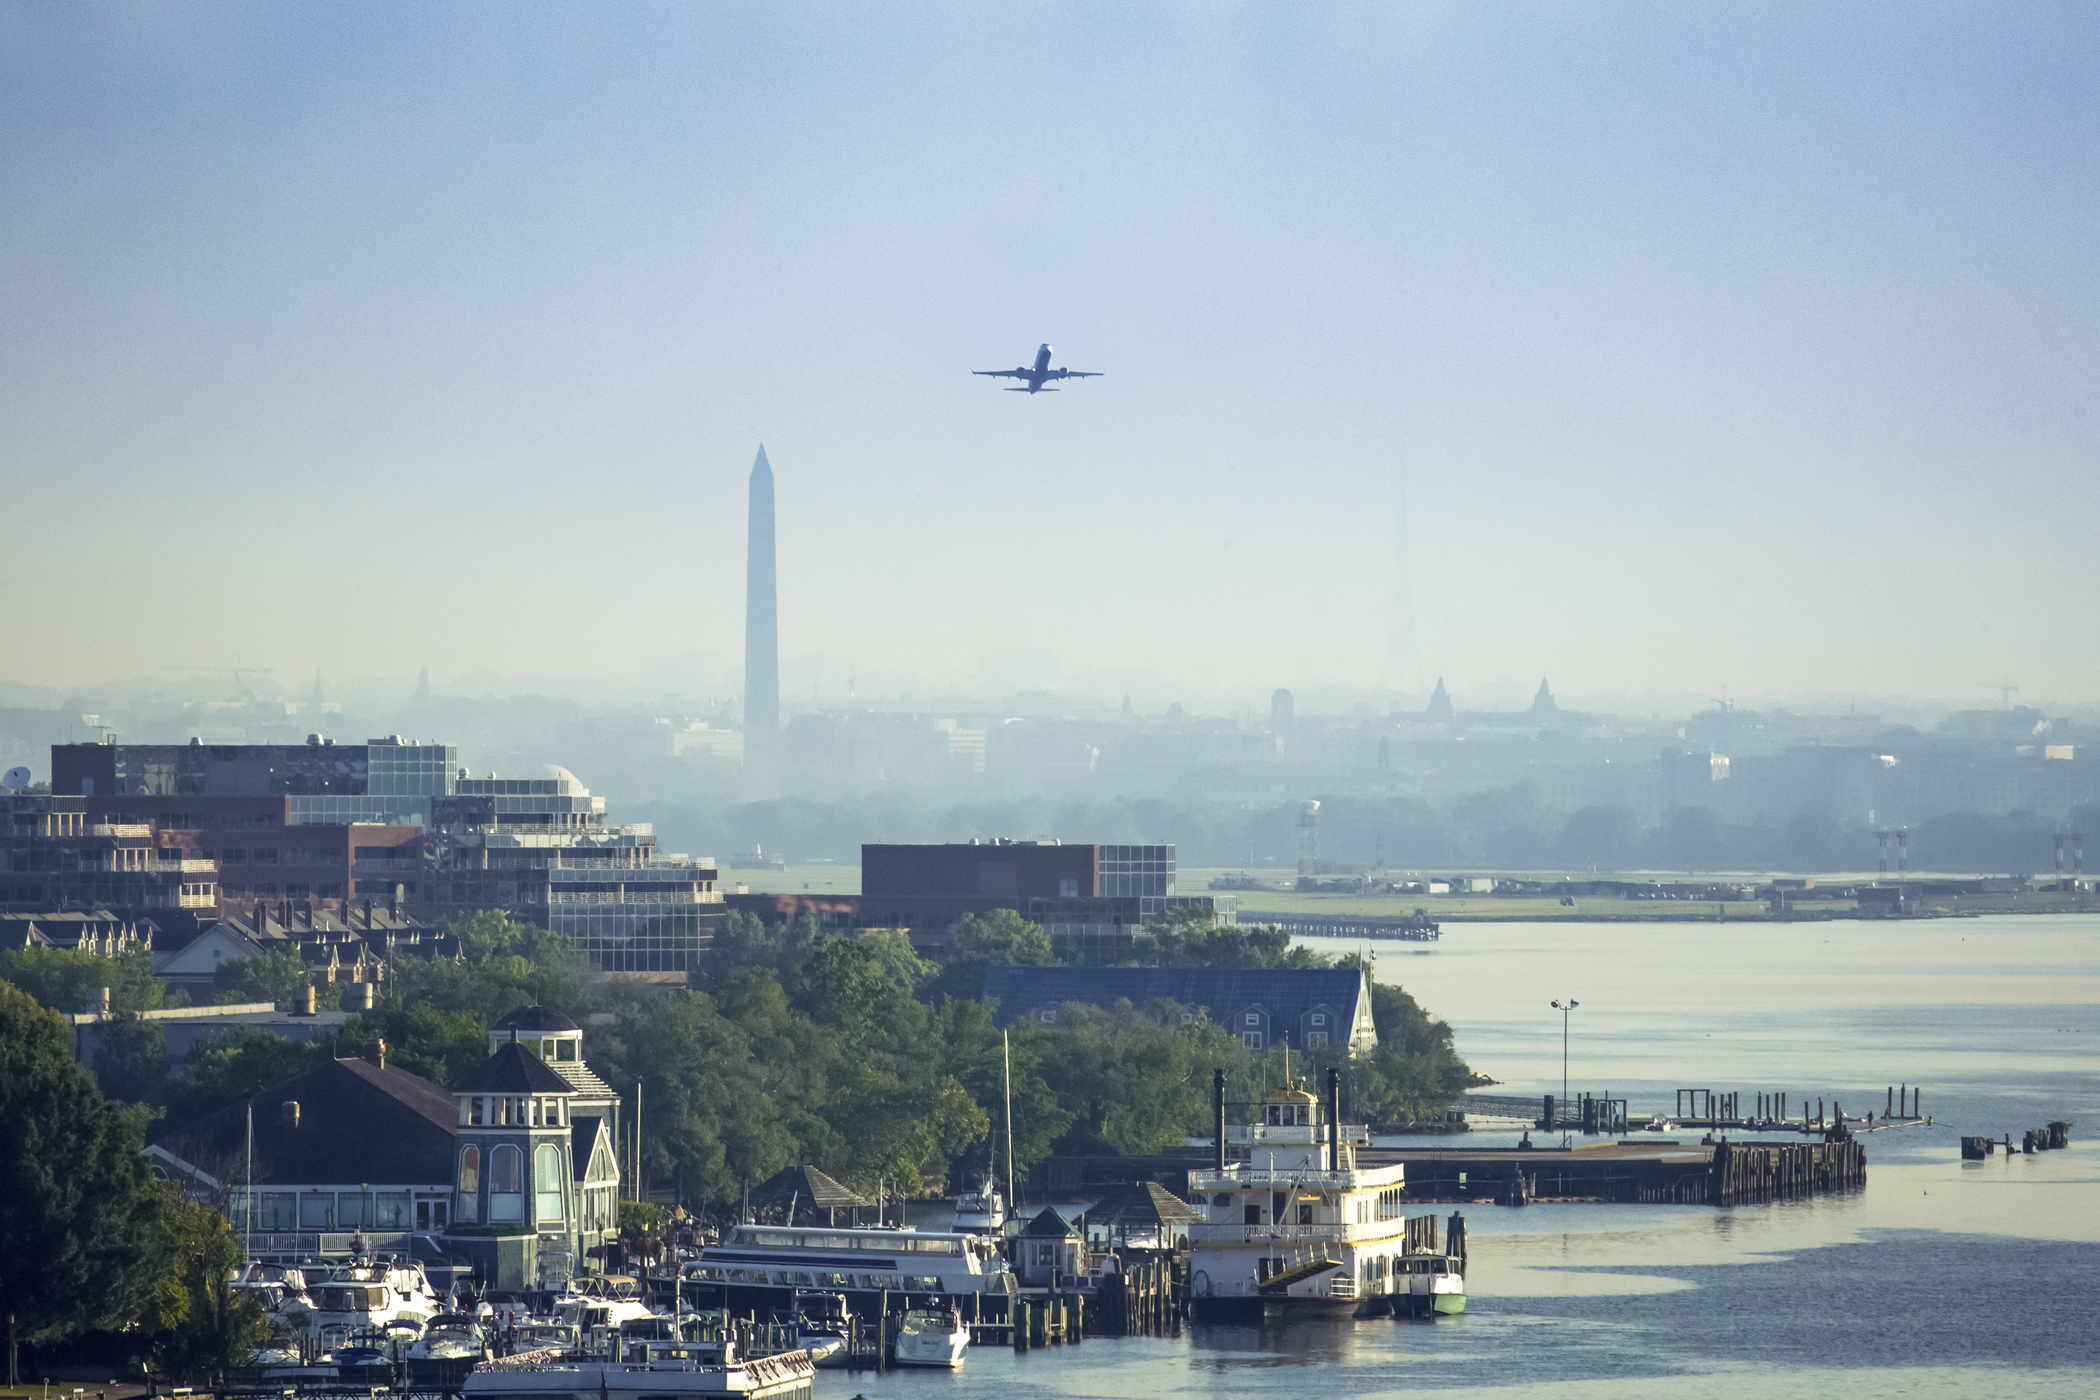 Alexandria_with_Washington_Monument_edited_CREDIT_K_Summerer_for_Visit_Alexandria